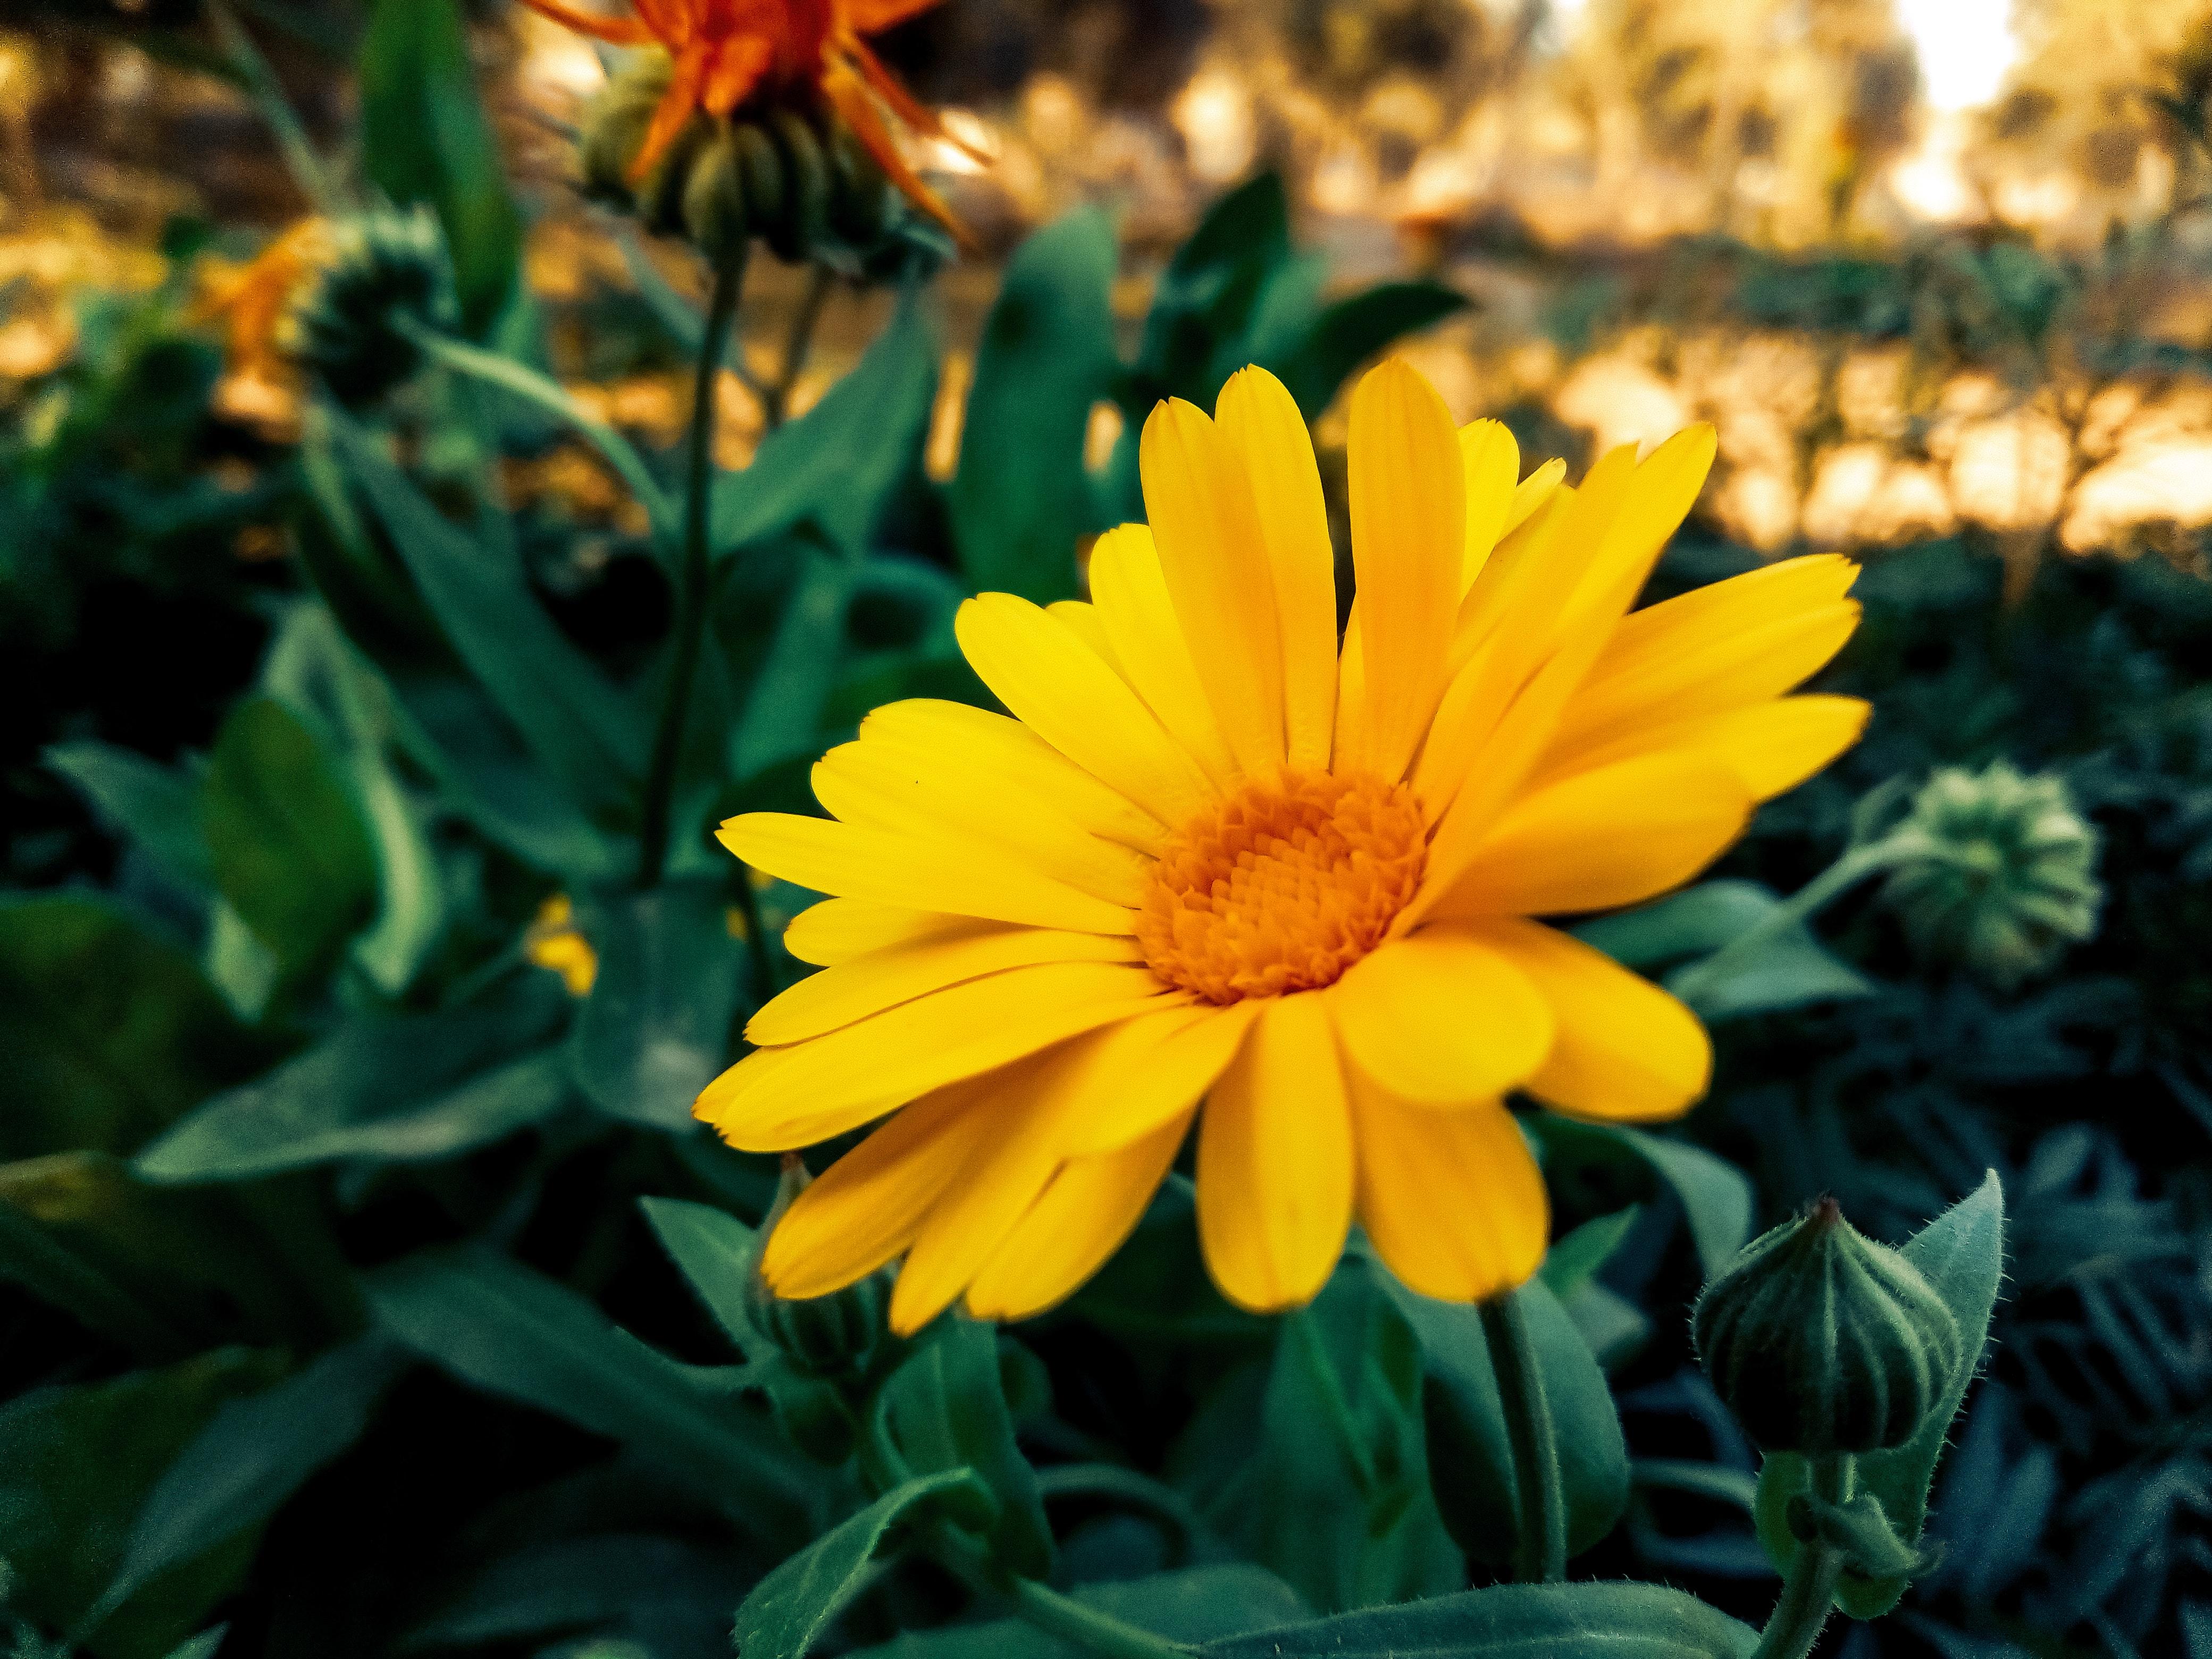 Foto Stok Gratis Tentang Bunga Matahari Cantik Indah